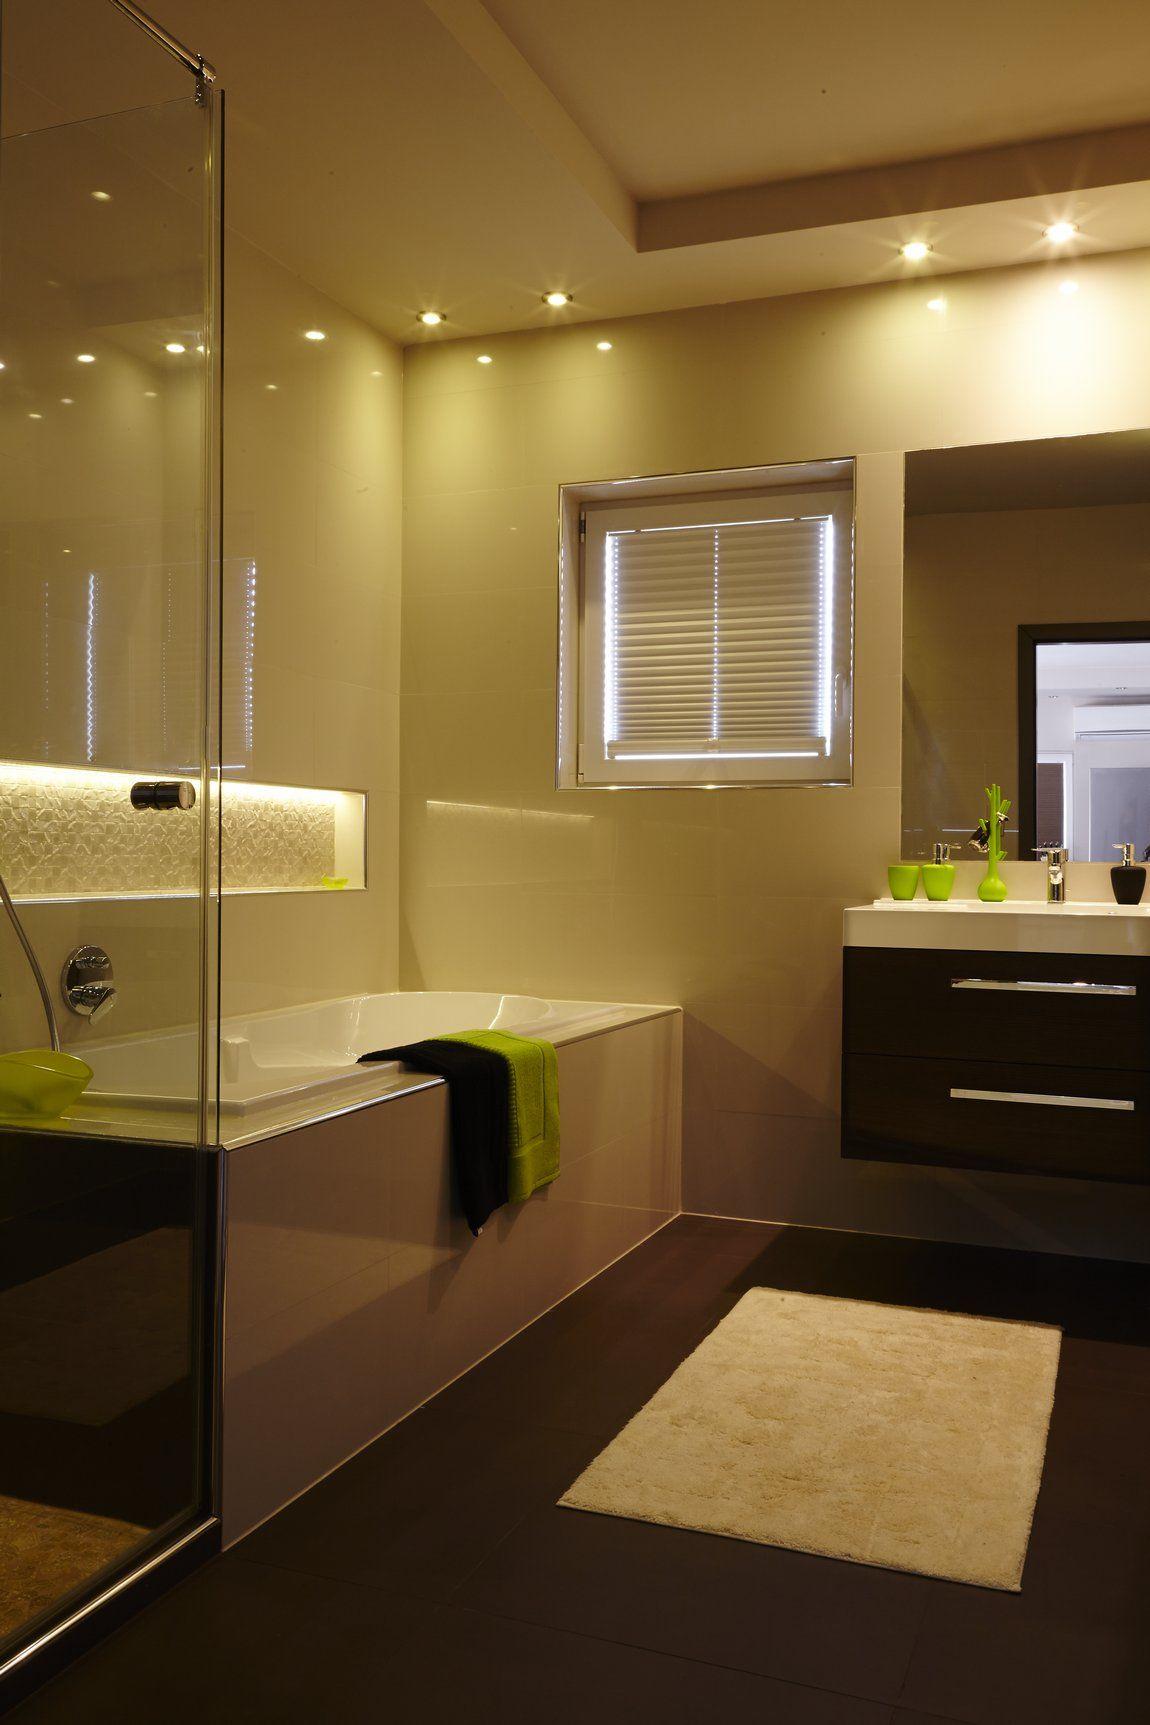 modern furdoszoba furdokad  home design  Pinterest  Dream bathrooms and Sweet dreams